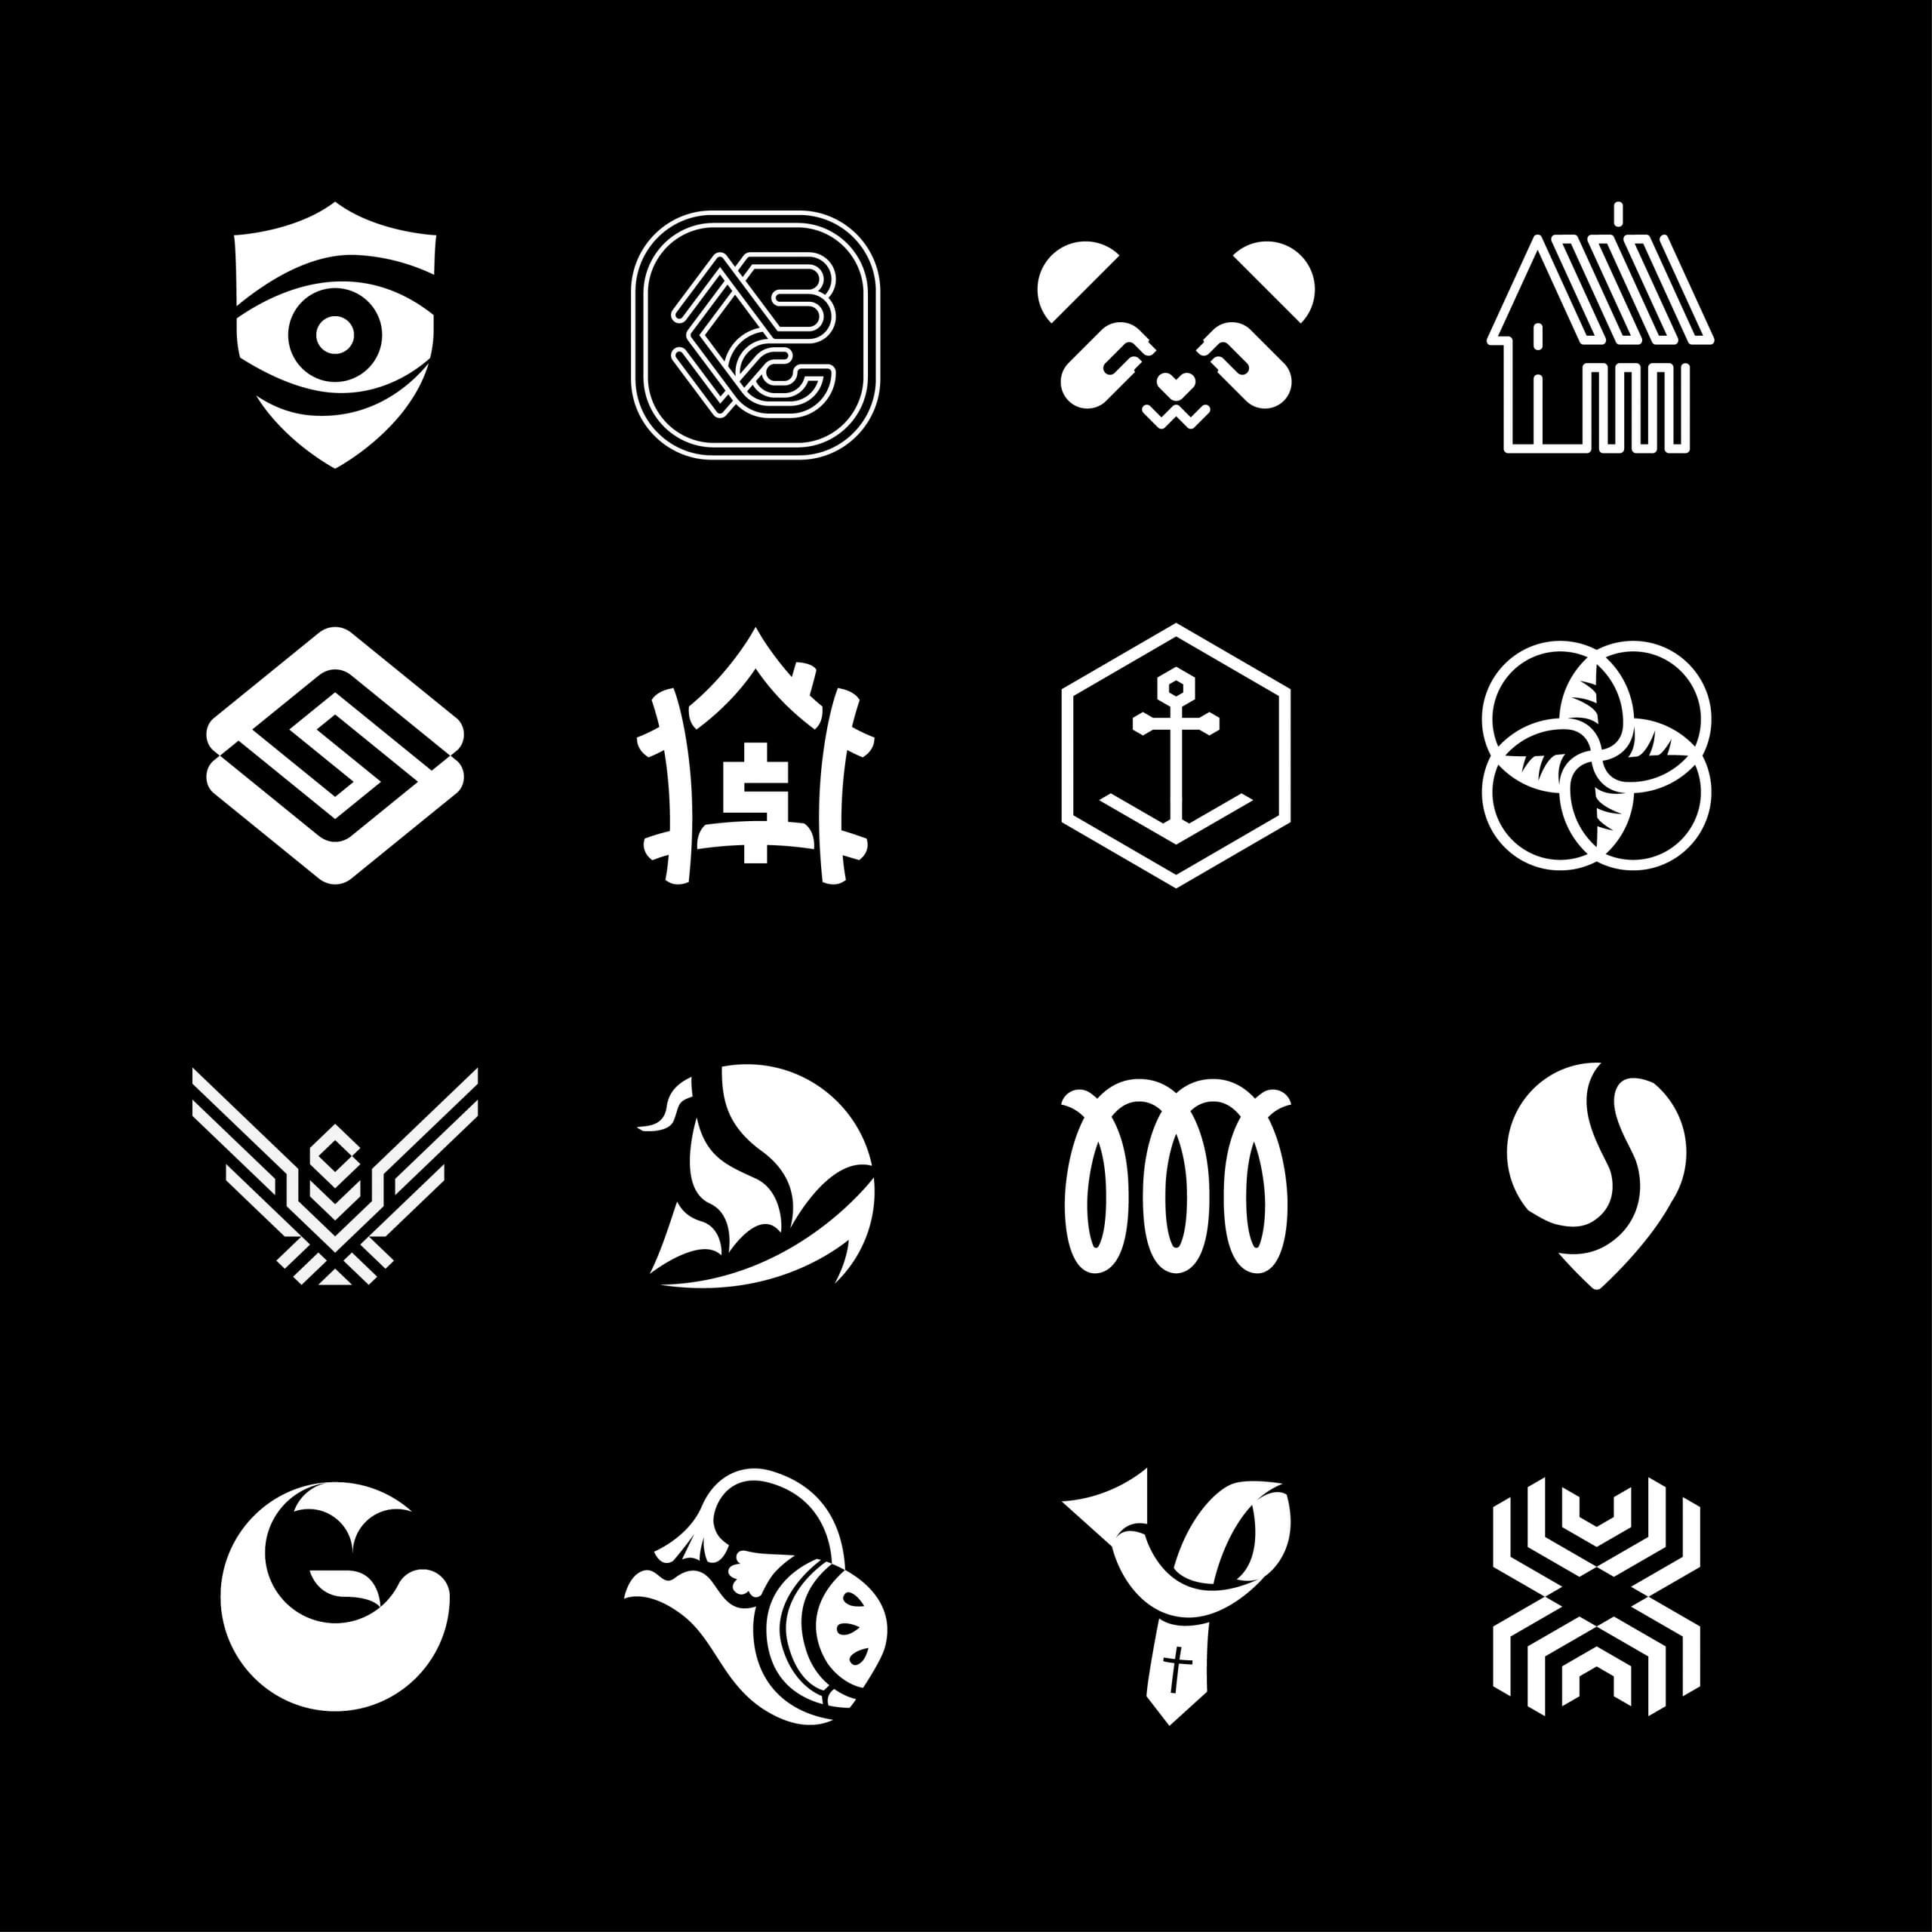 Logos Design - DY Blog